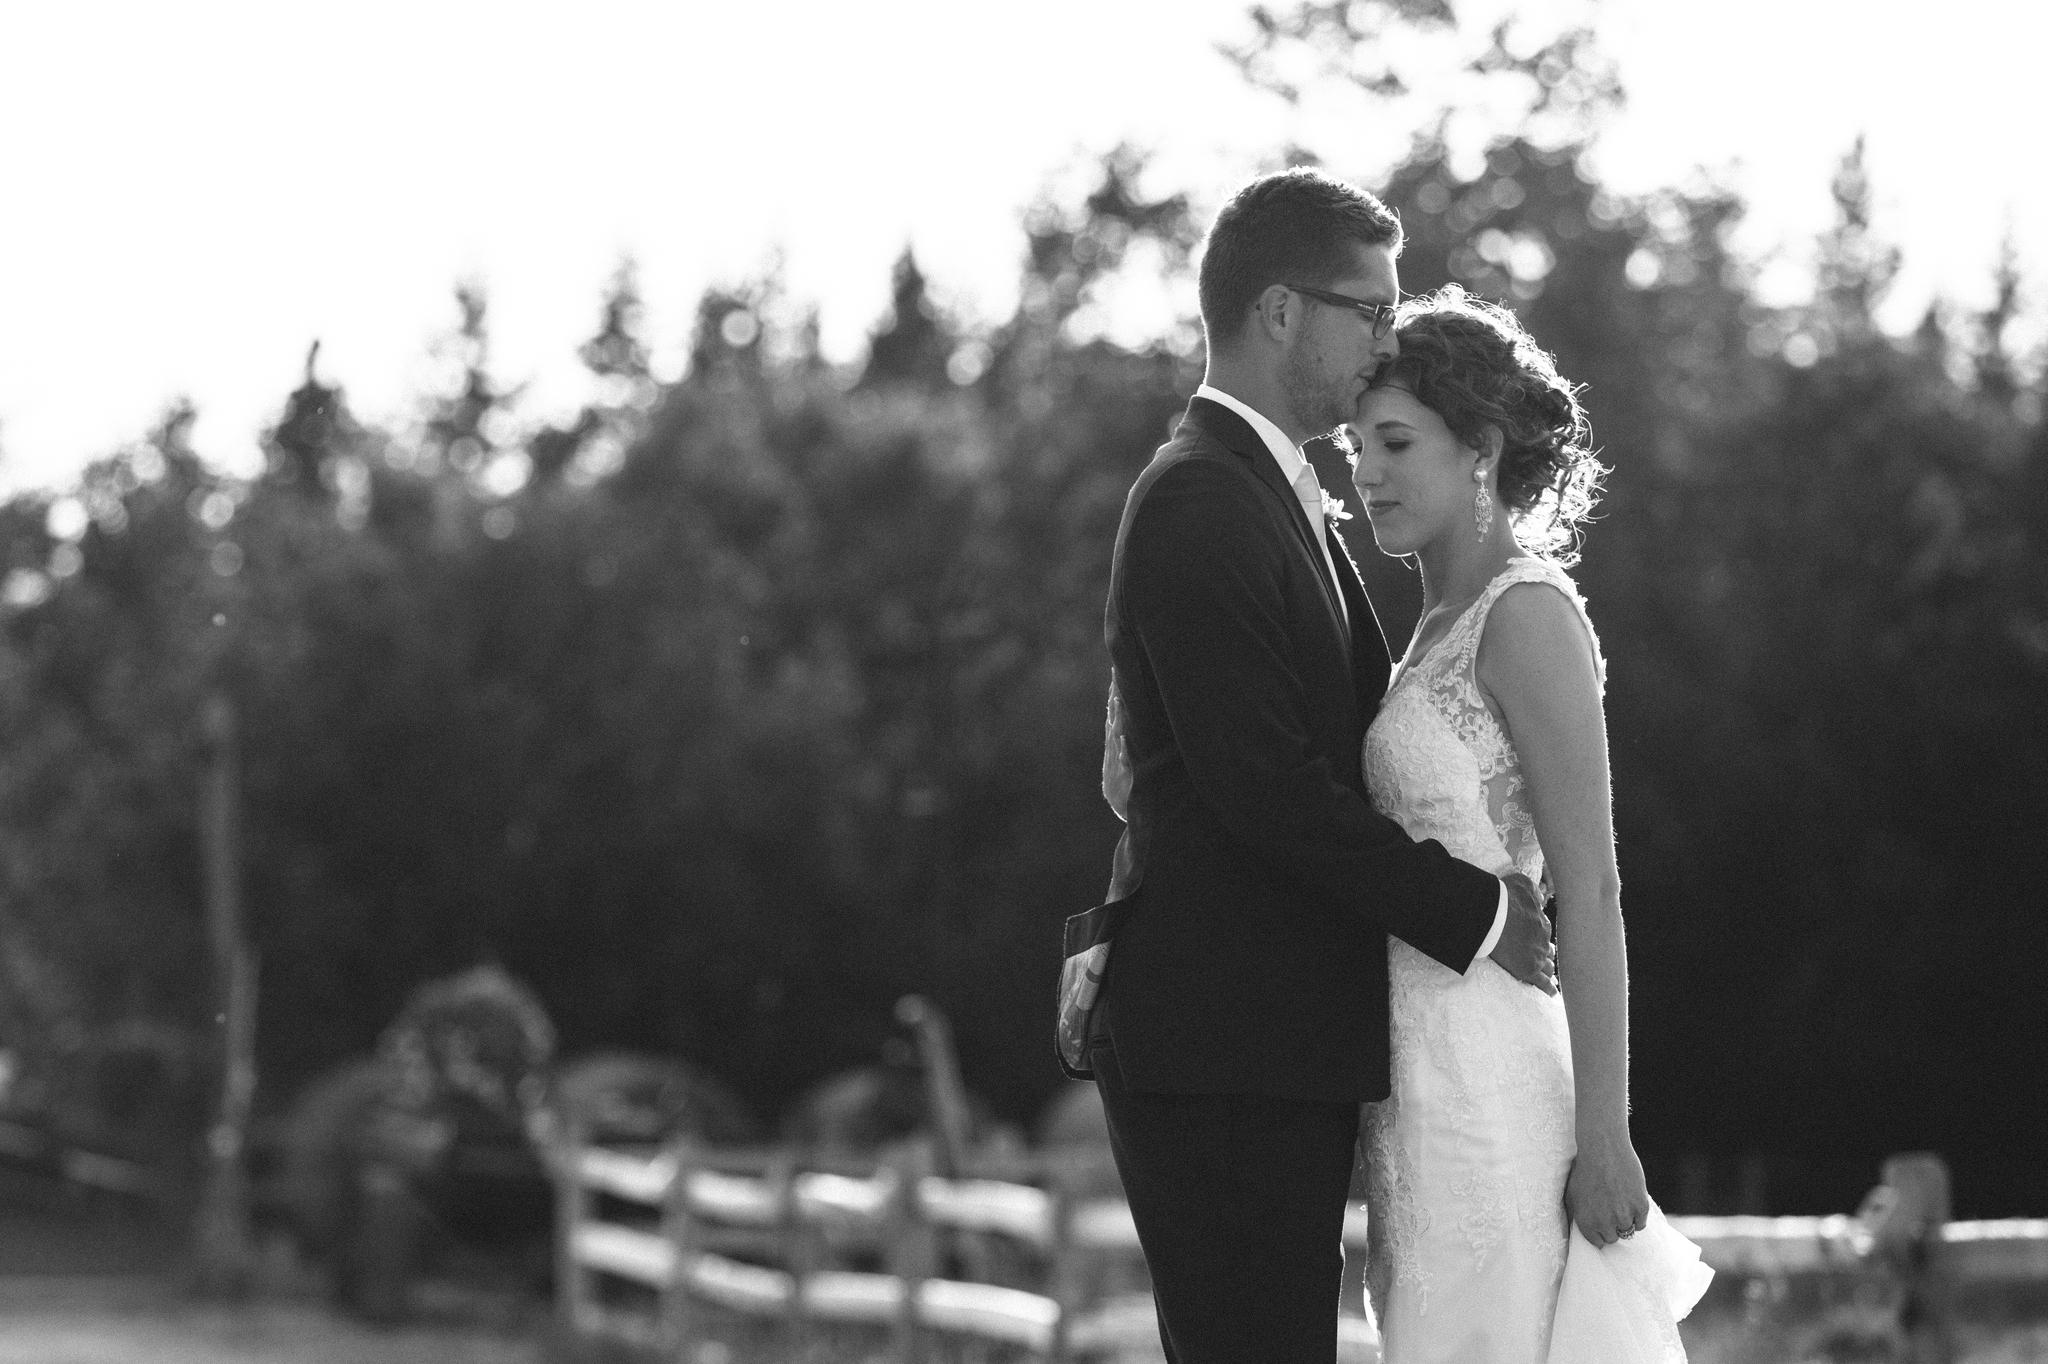 Michelle & Scott's Rustic Wedding at Lions Garden